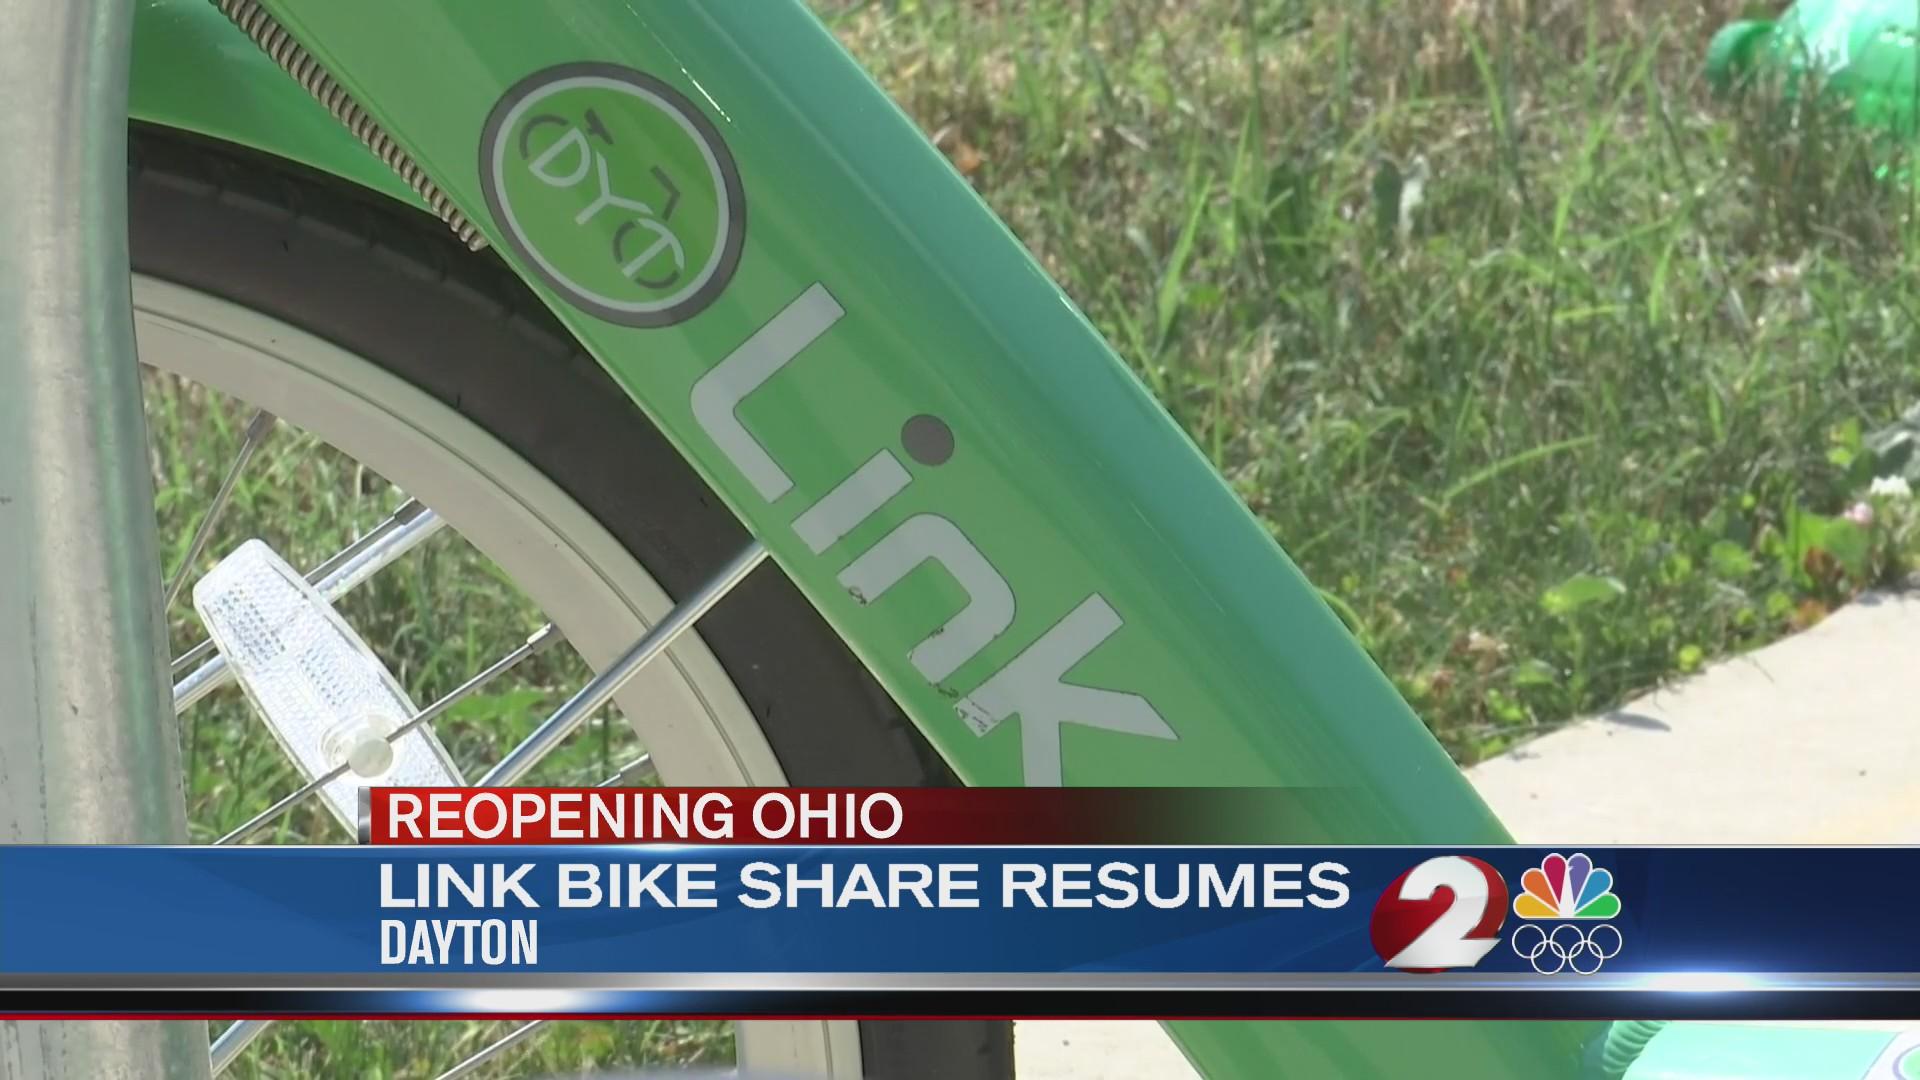 Link bike share resumes